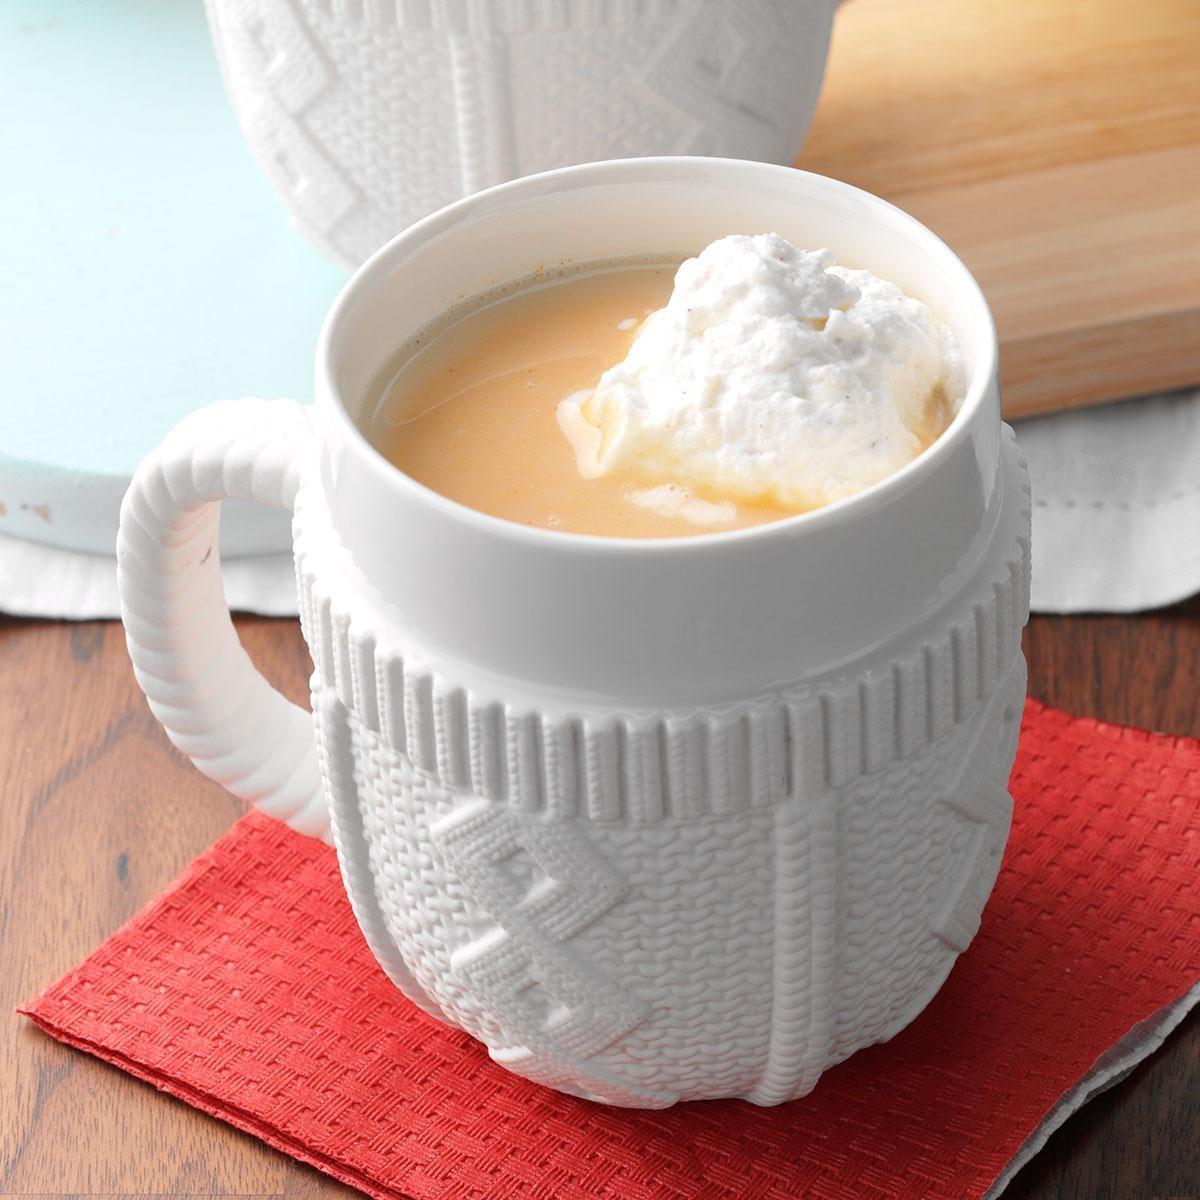 Pumpkin-Spiced Hot Chocolate